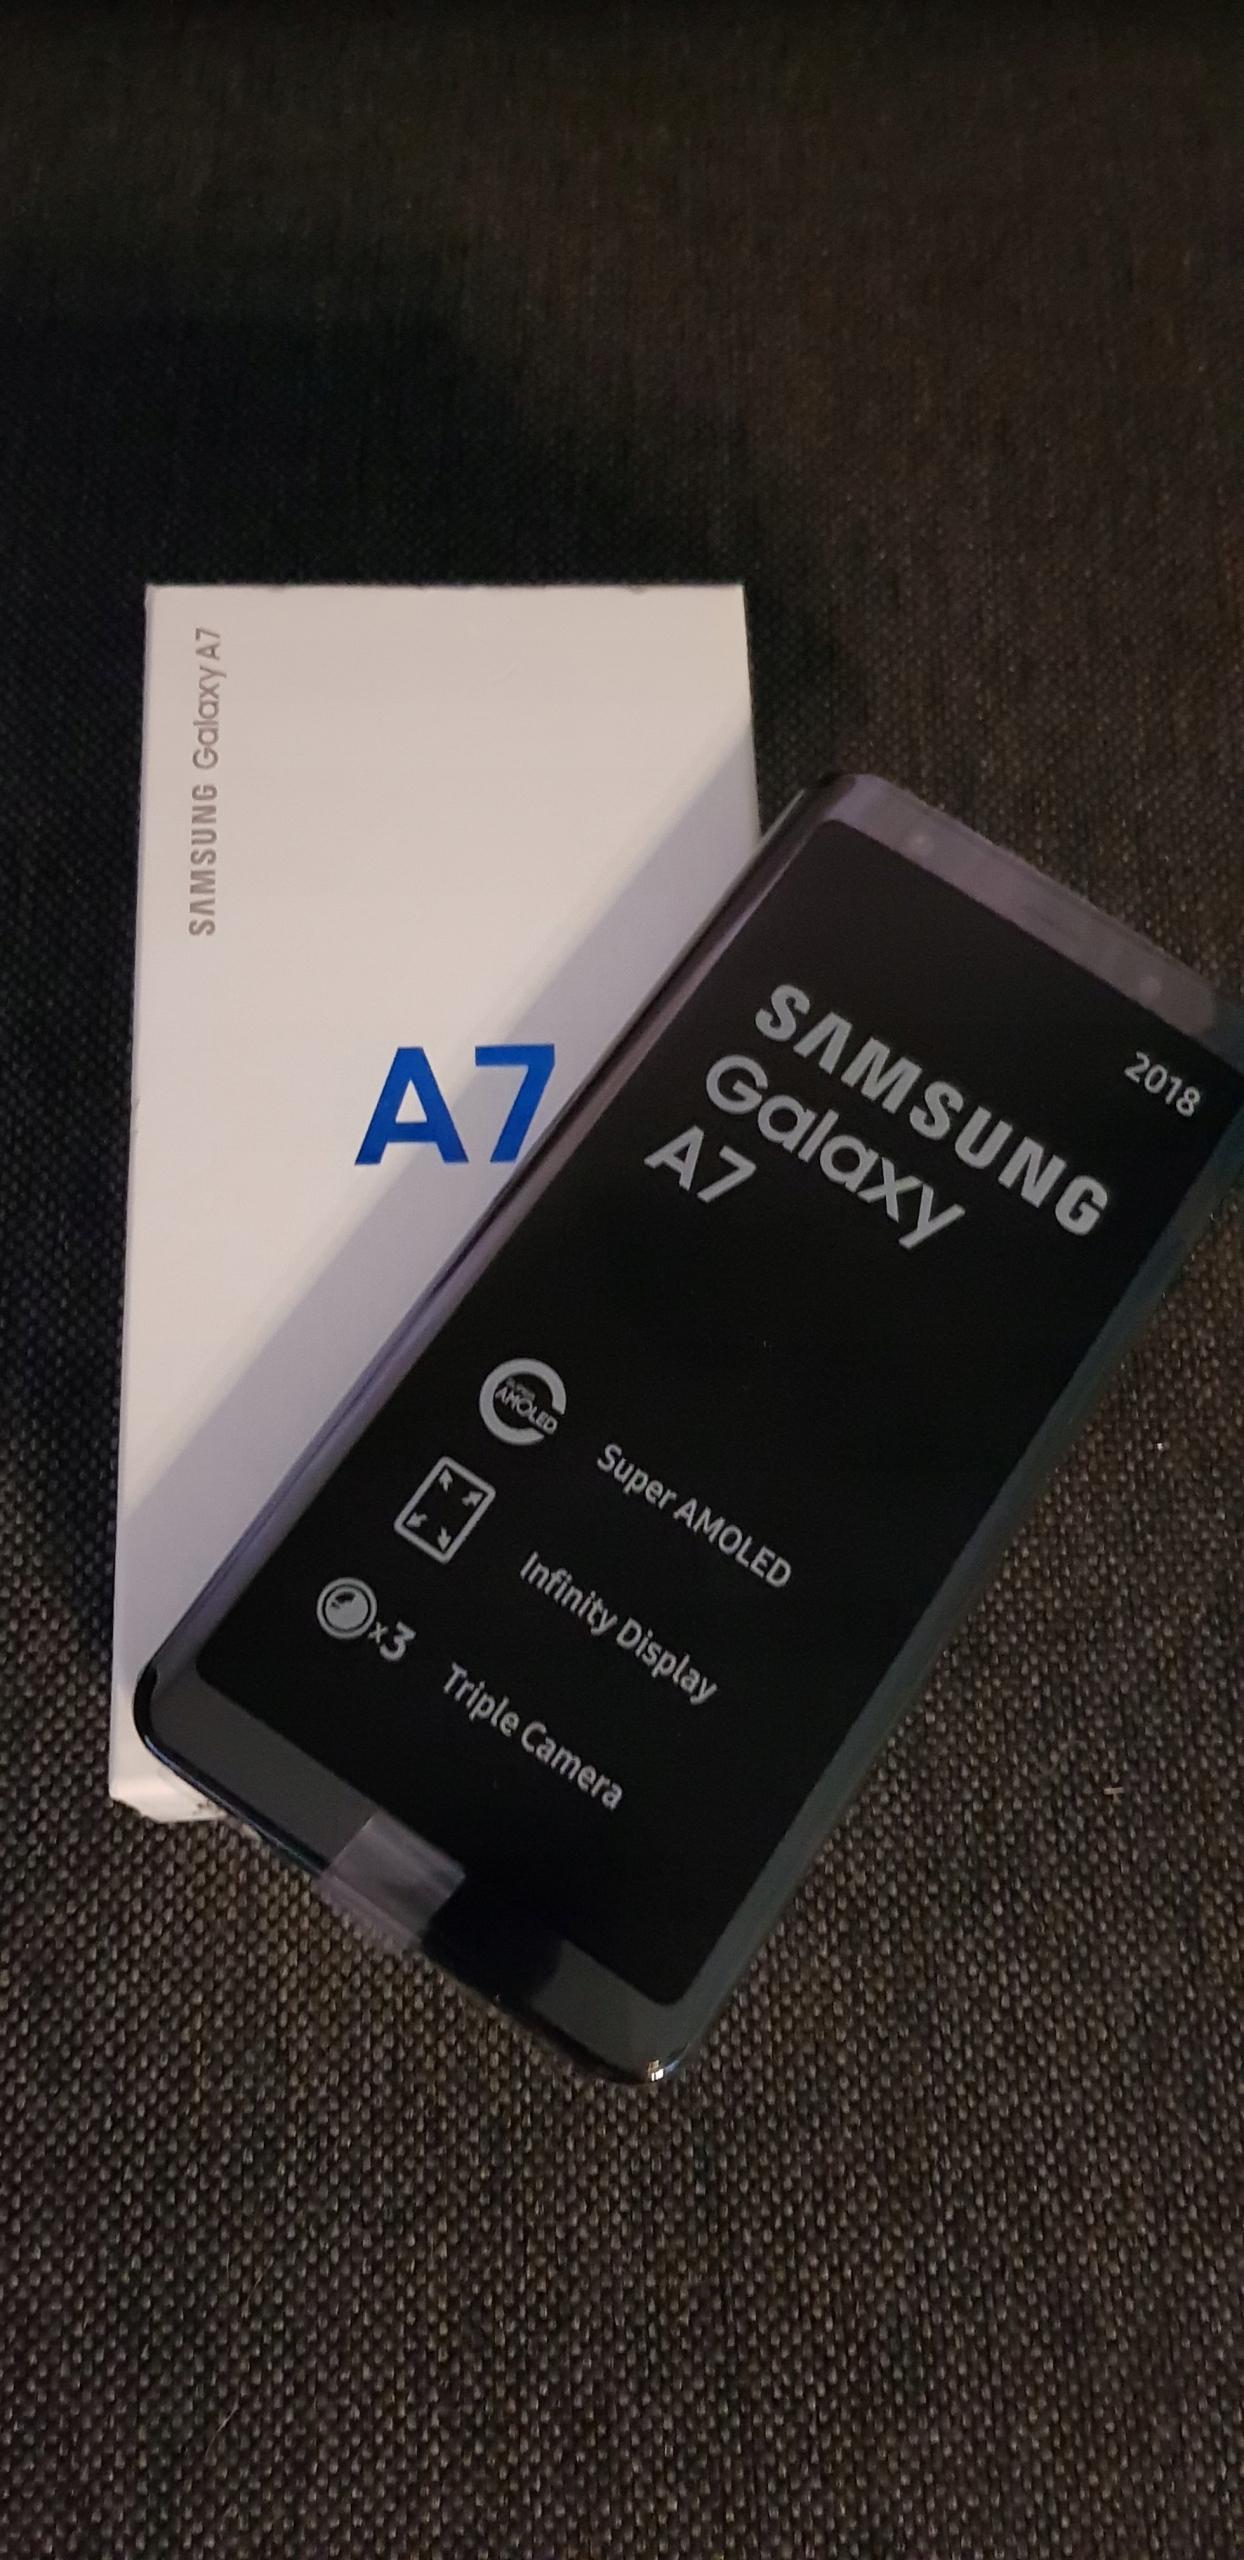 dc72e76d8fc Nowy Samsung A7 2018 A750 MEDIA MARKT - 7771798769 - oficjalne ...